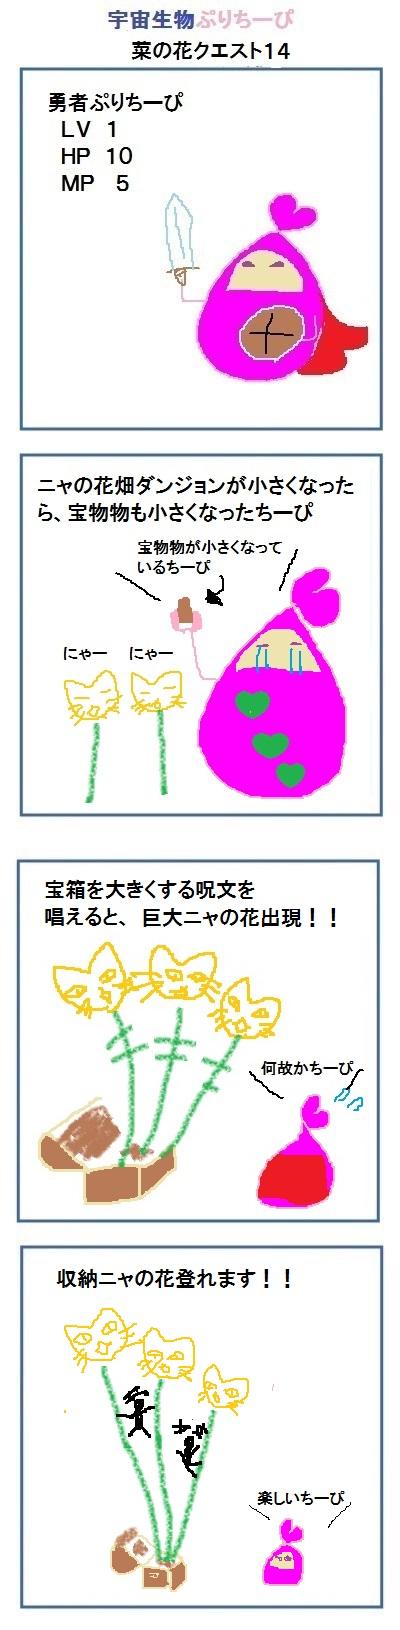 160327_nanohana_quest14.jpg